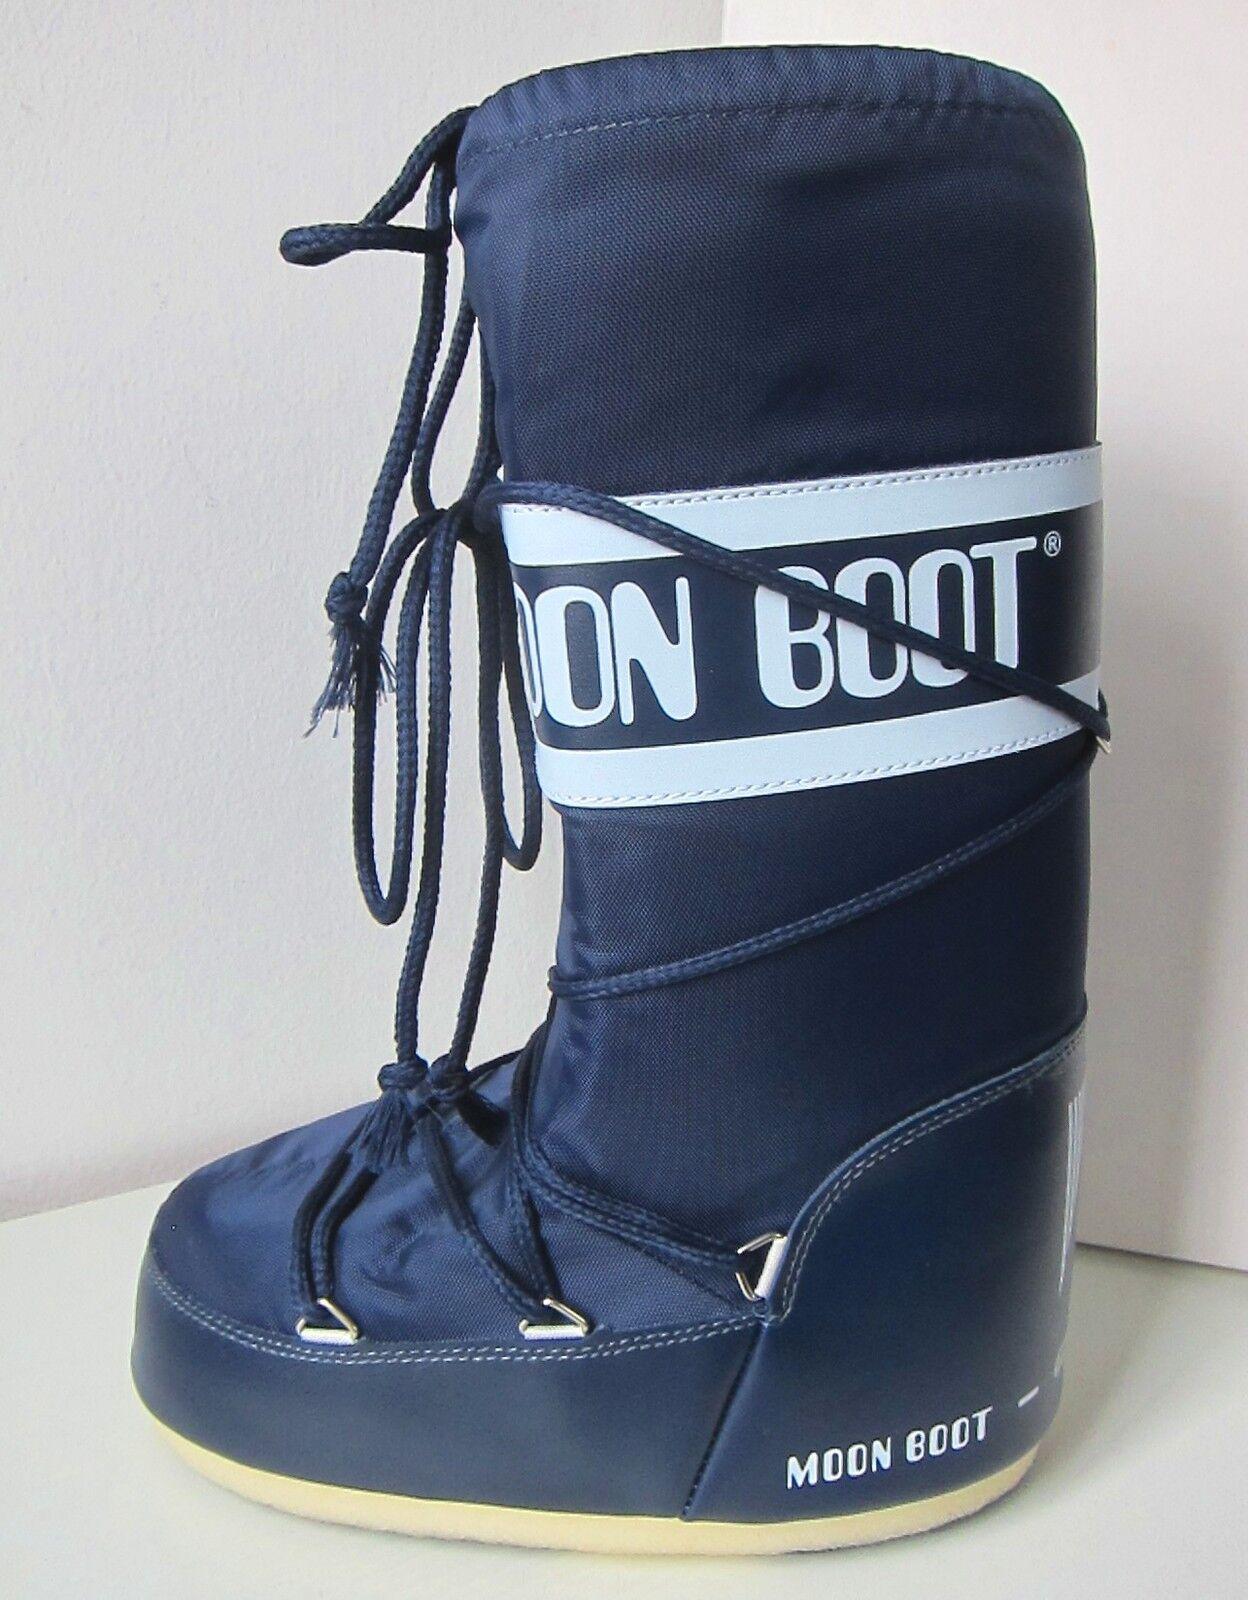 Tecnica Tecnica Tecnica Moon bota nylon azul oscuro talla 31 34 Moon botas Moonbotas azul  opciones a bajo precio